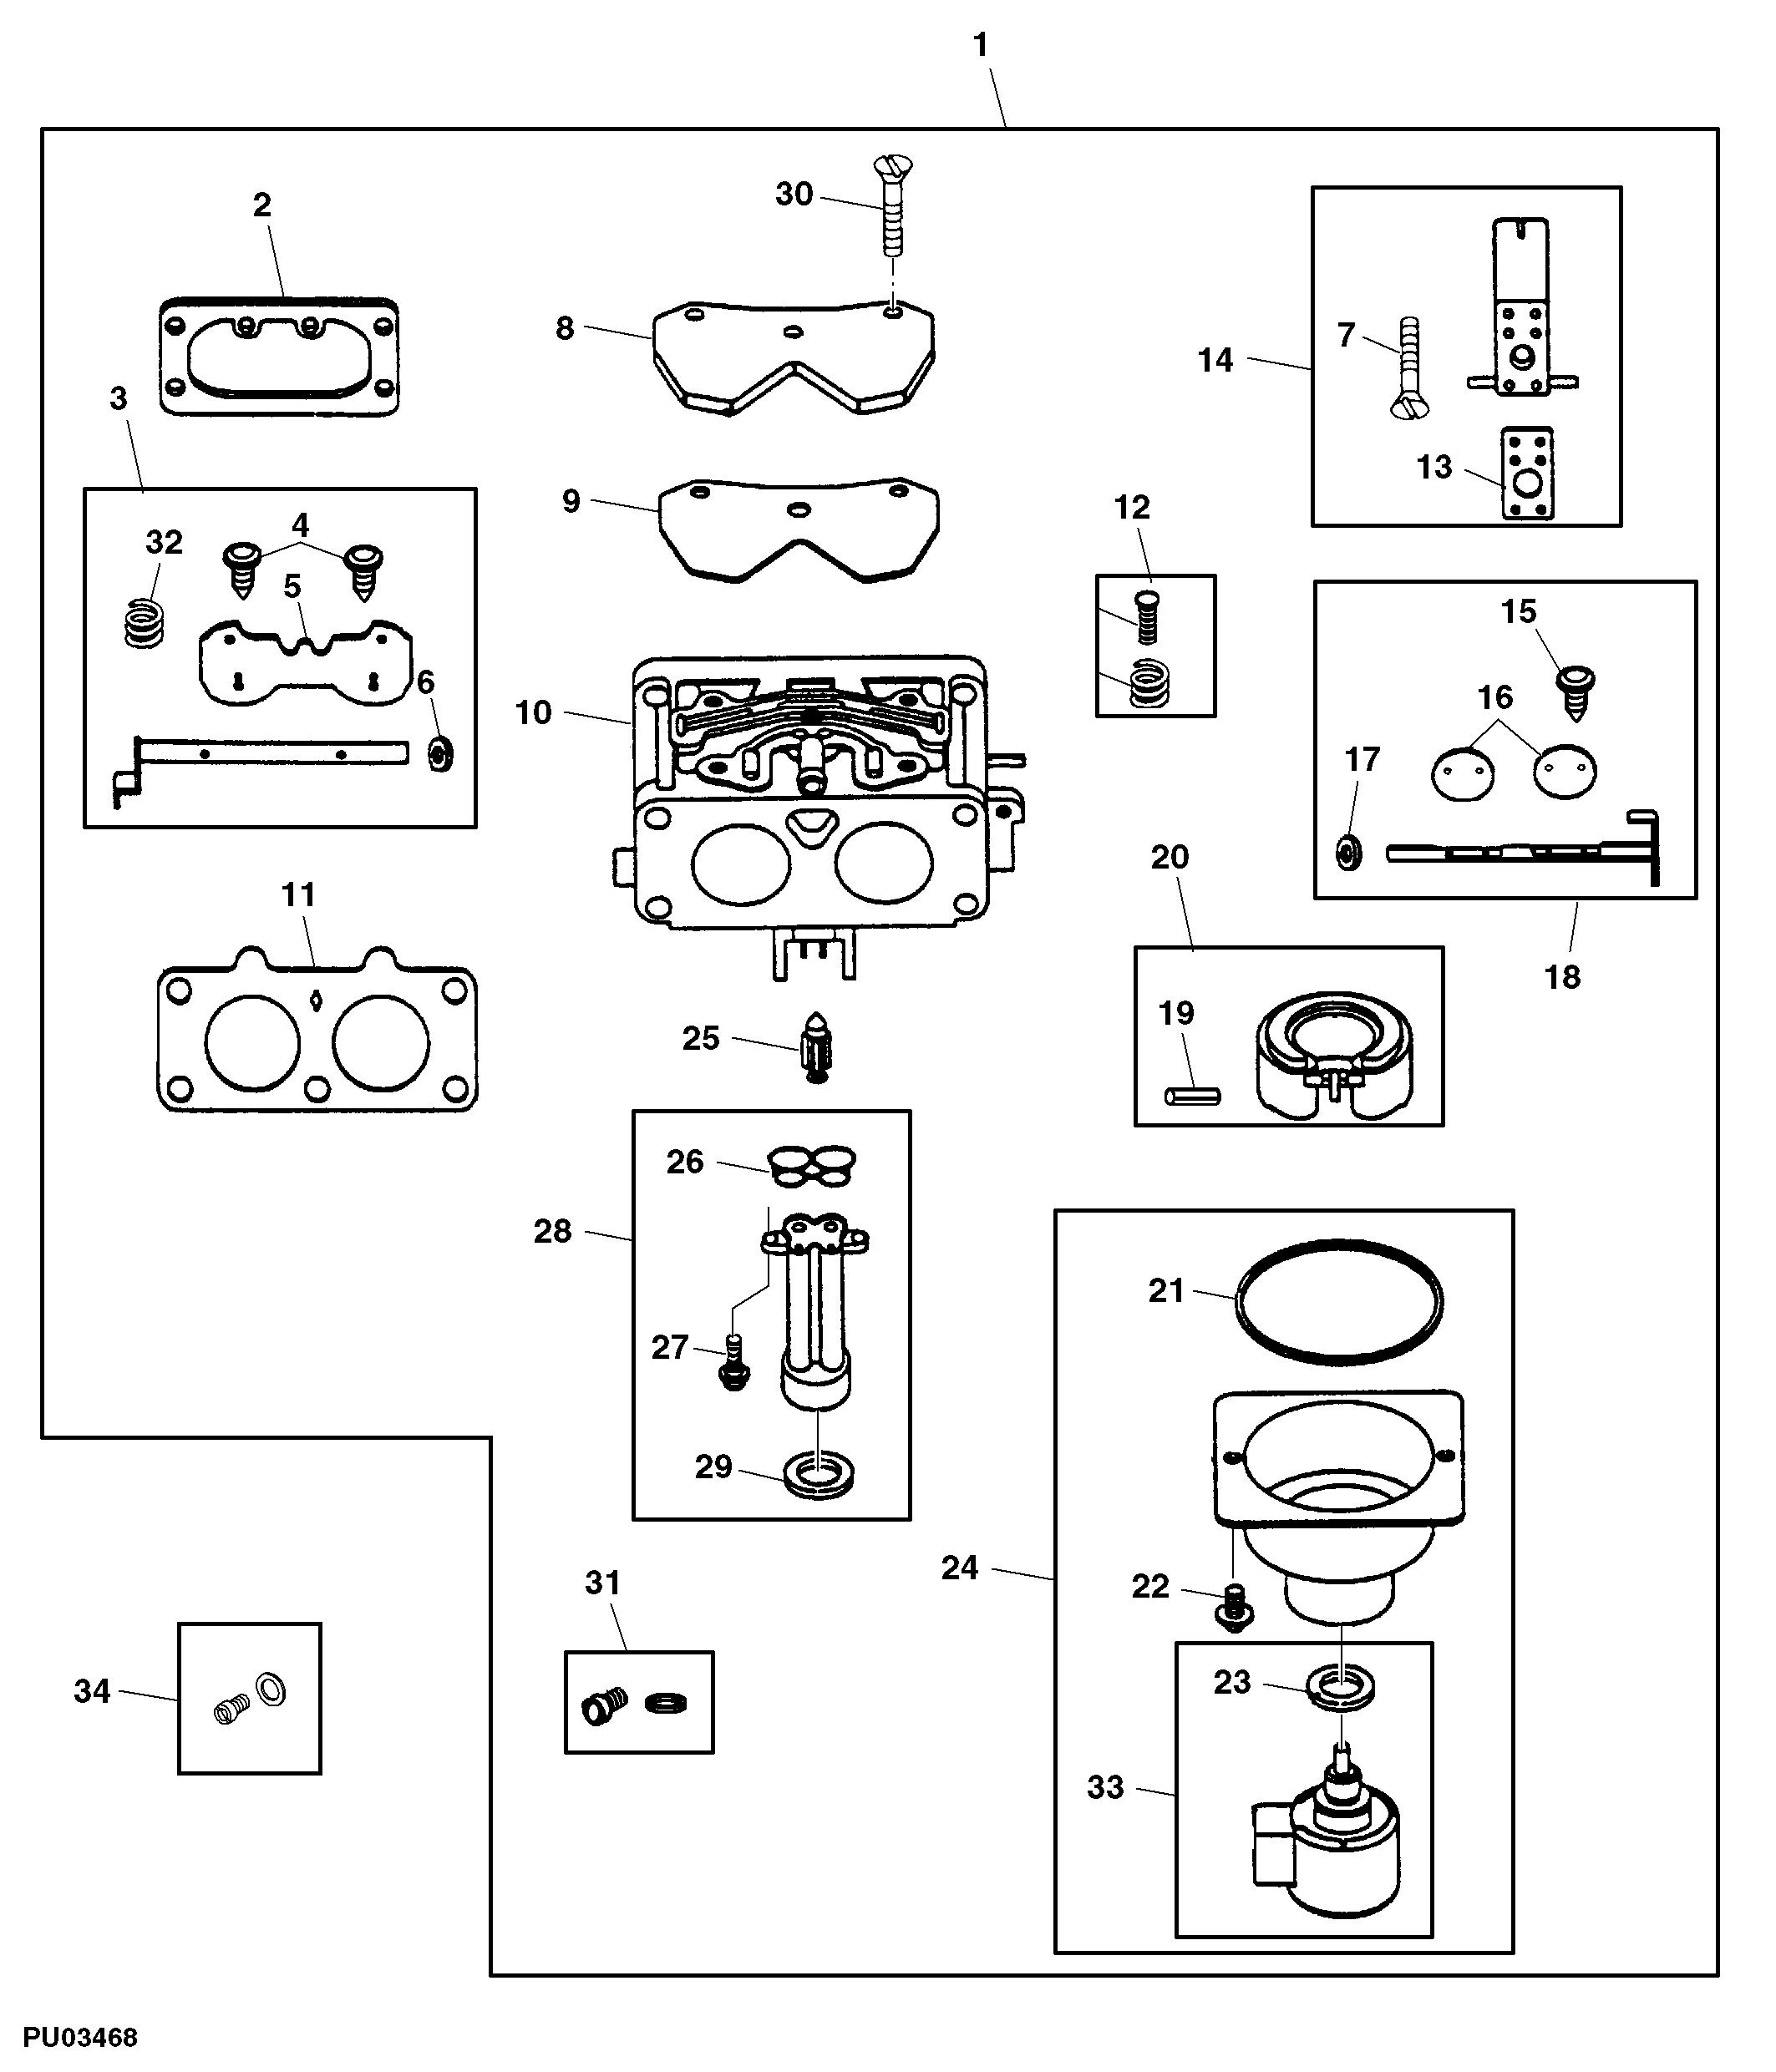 john deere 1020 wiring diagram smeg induction hob 1970 110